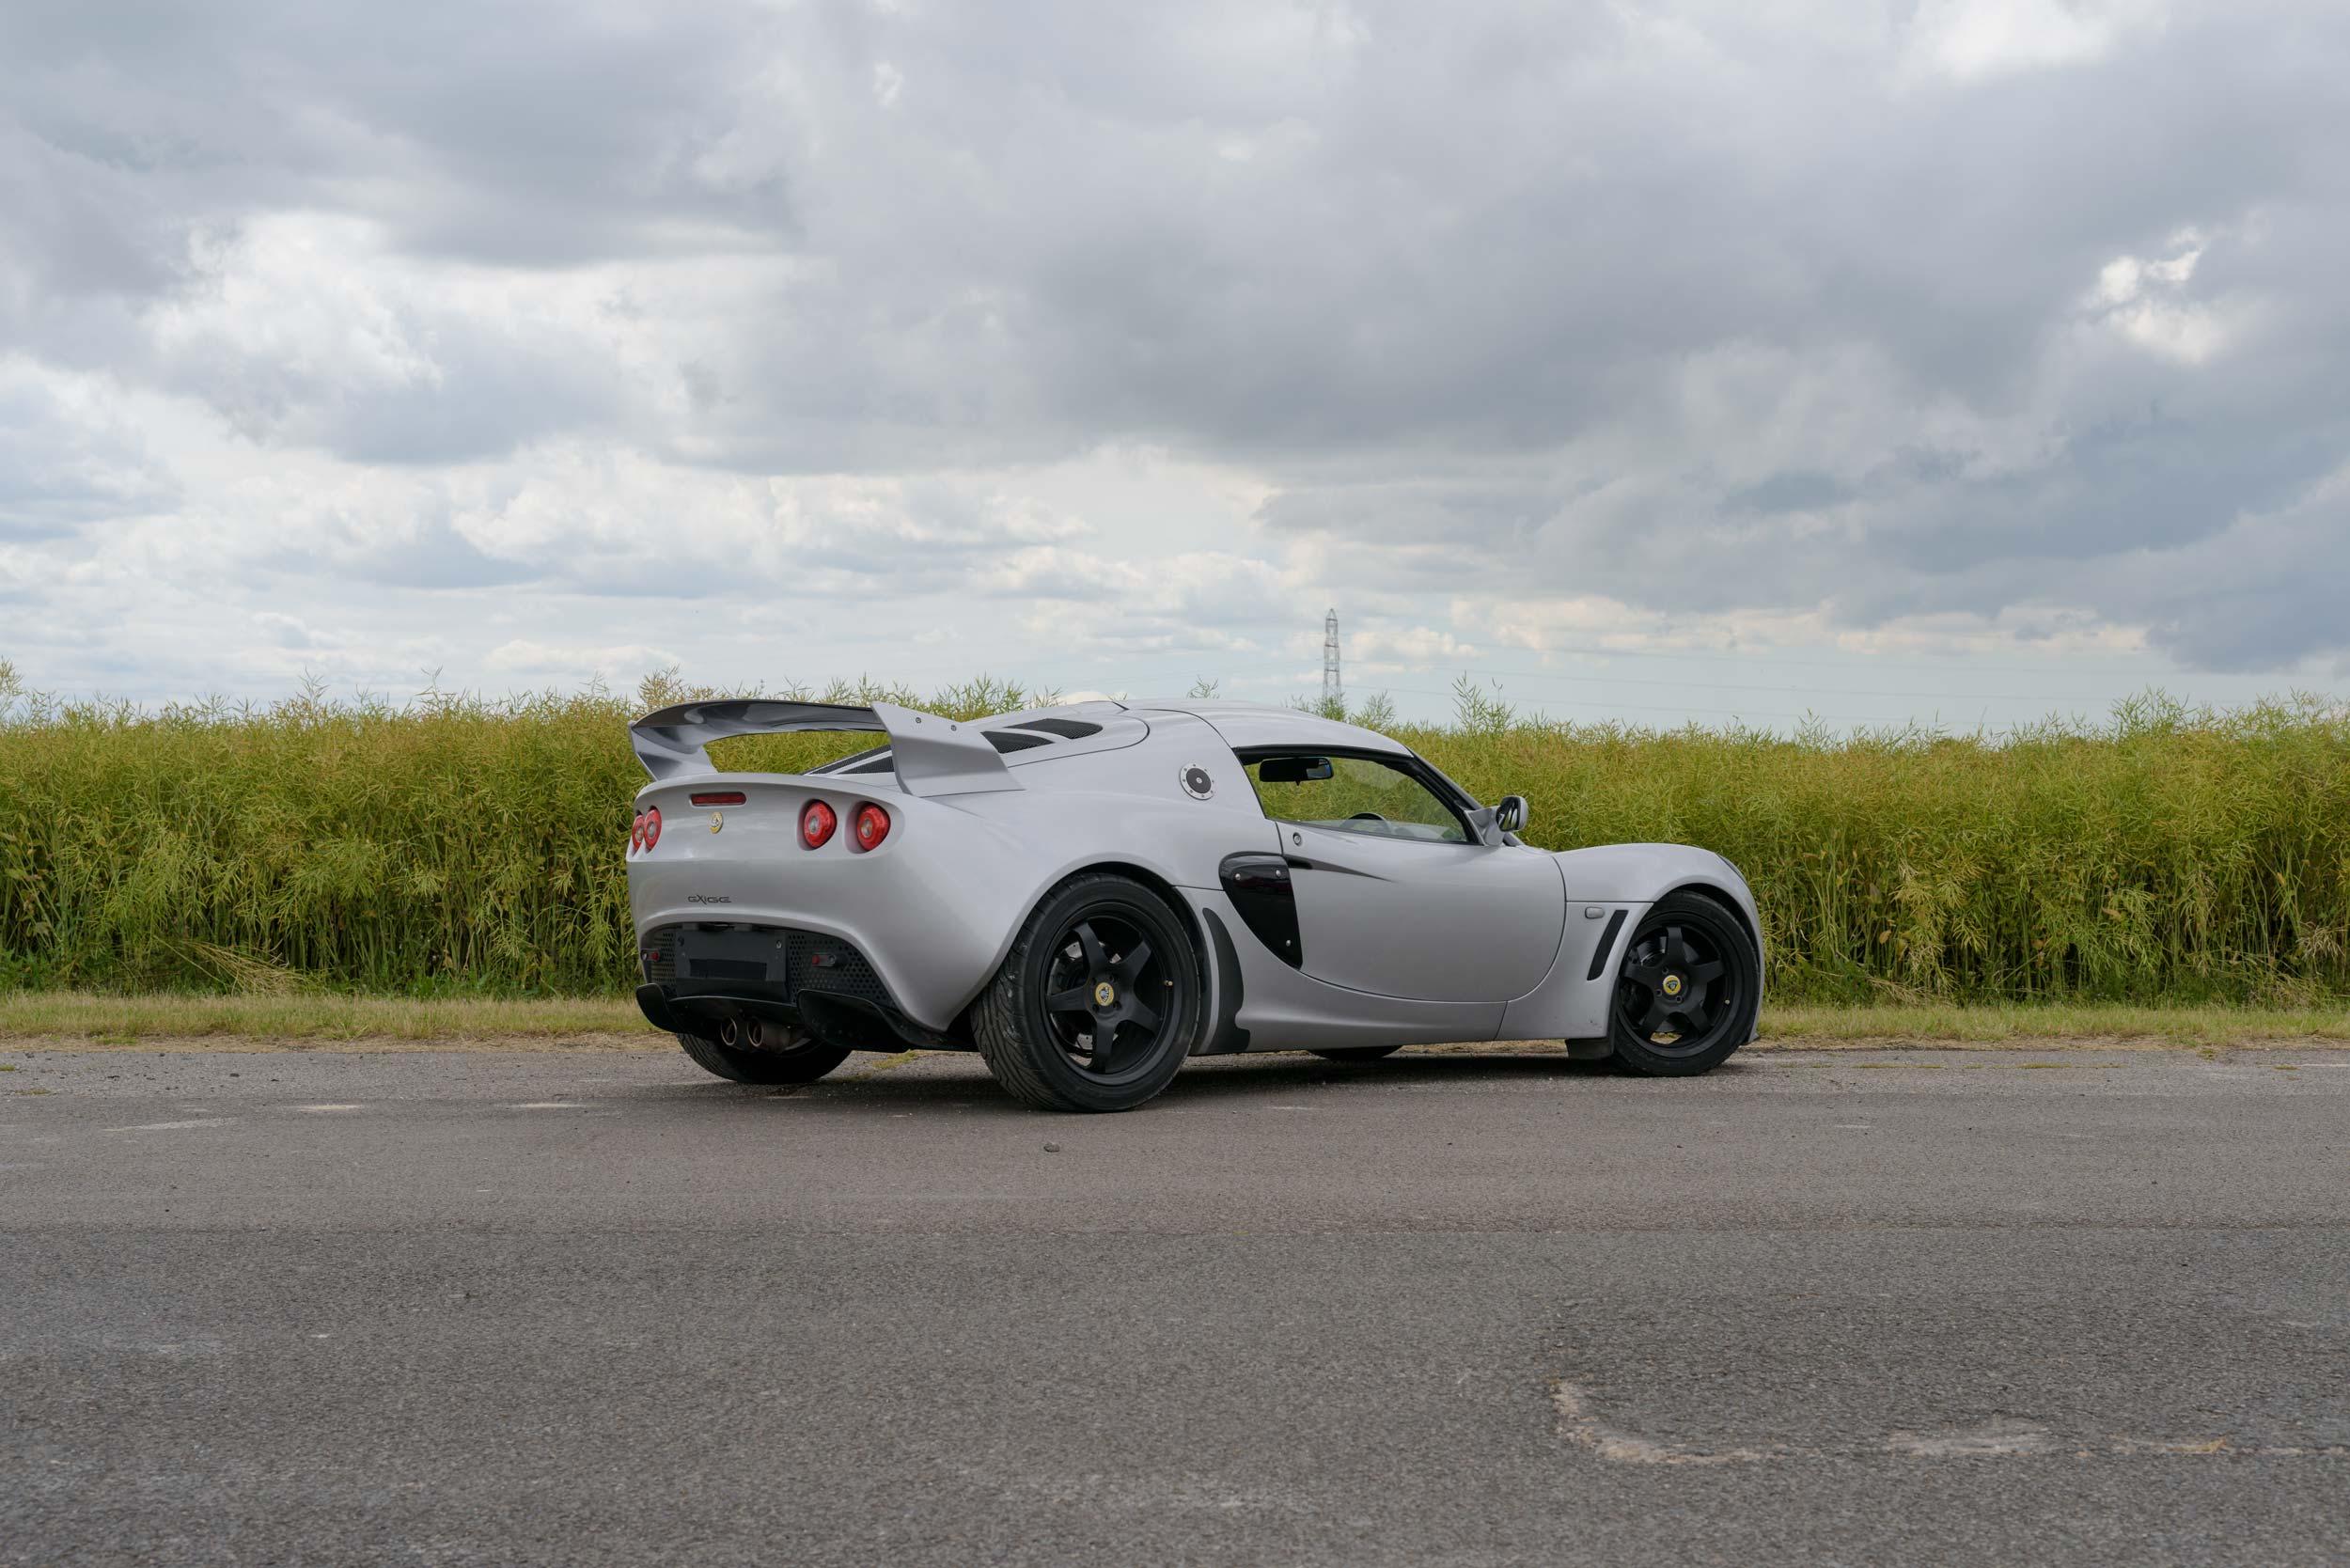 Lotus Elise Before Wipdesigns Automotive Photographer